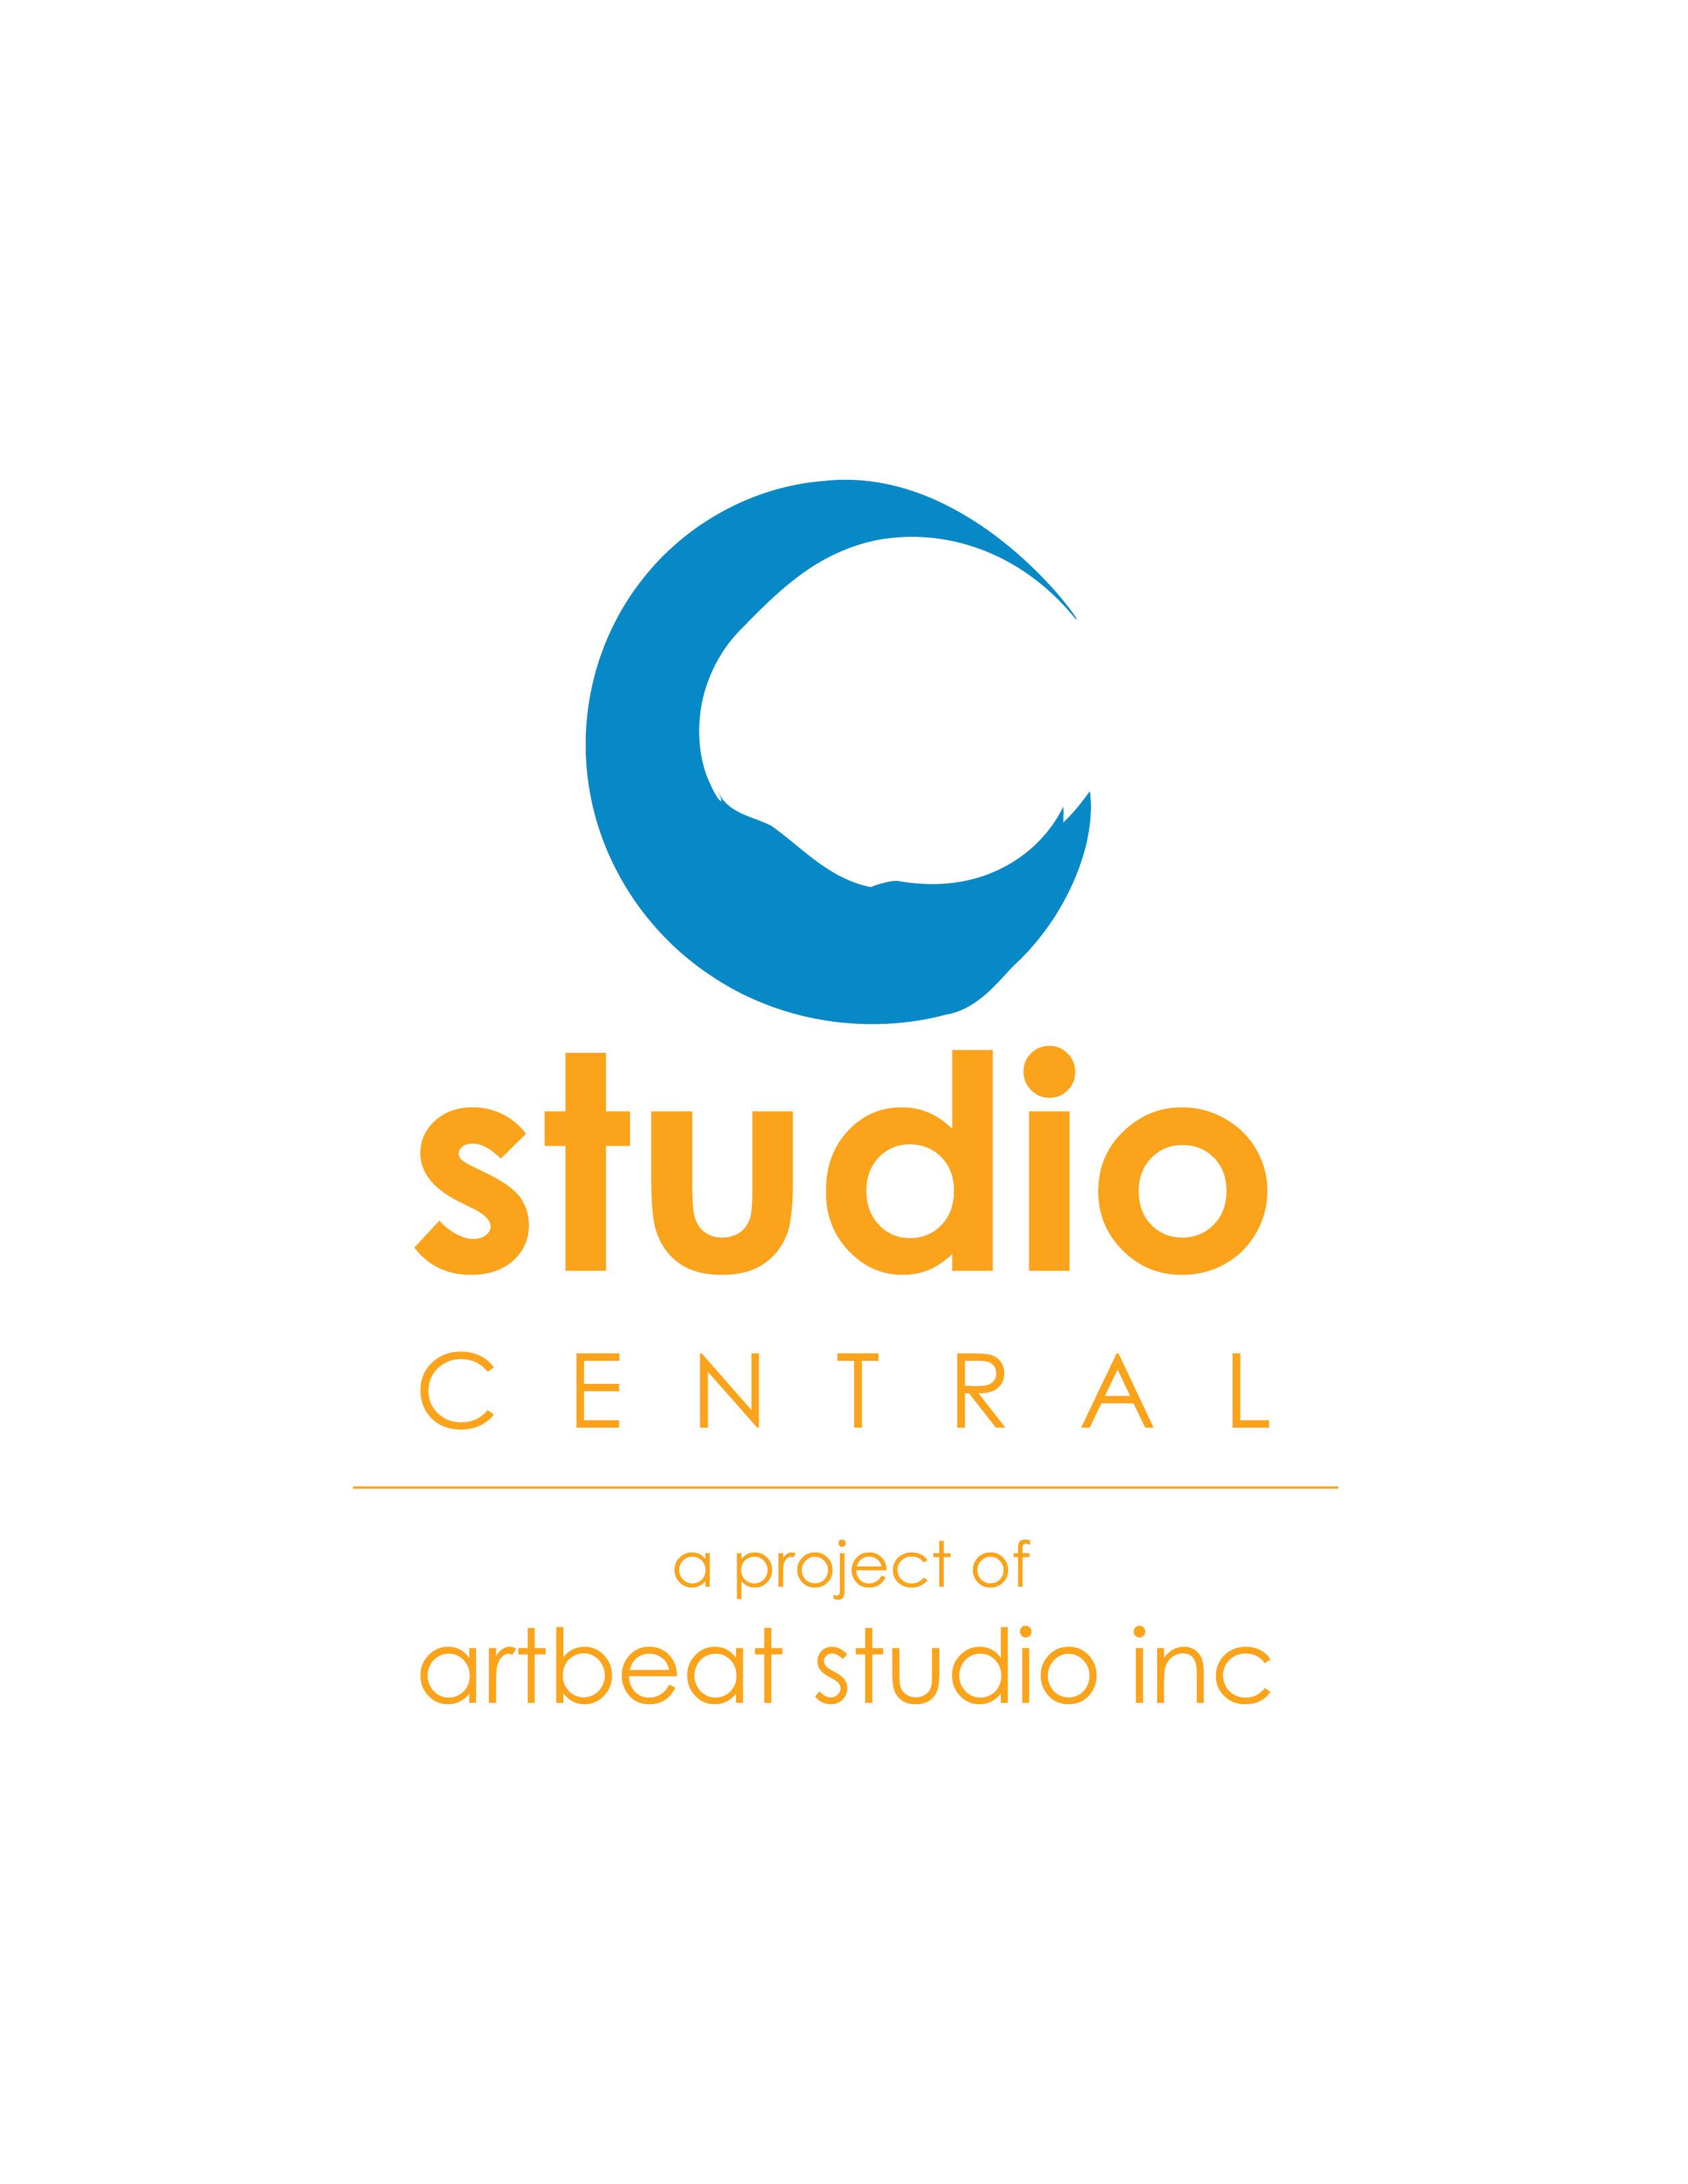 studiocentrallogo3.jpg